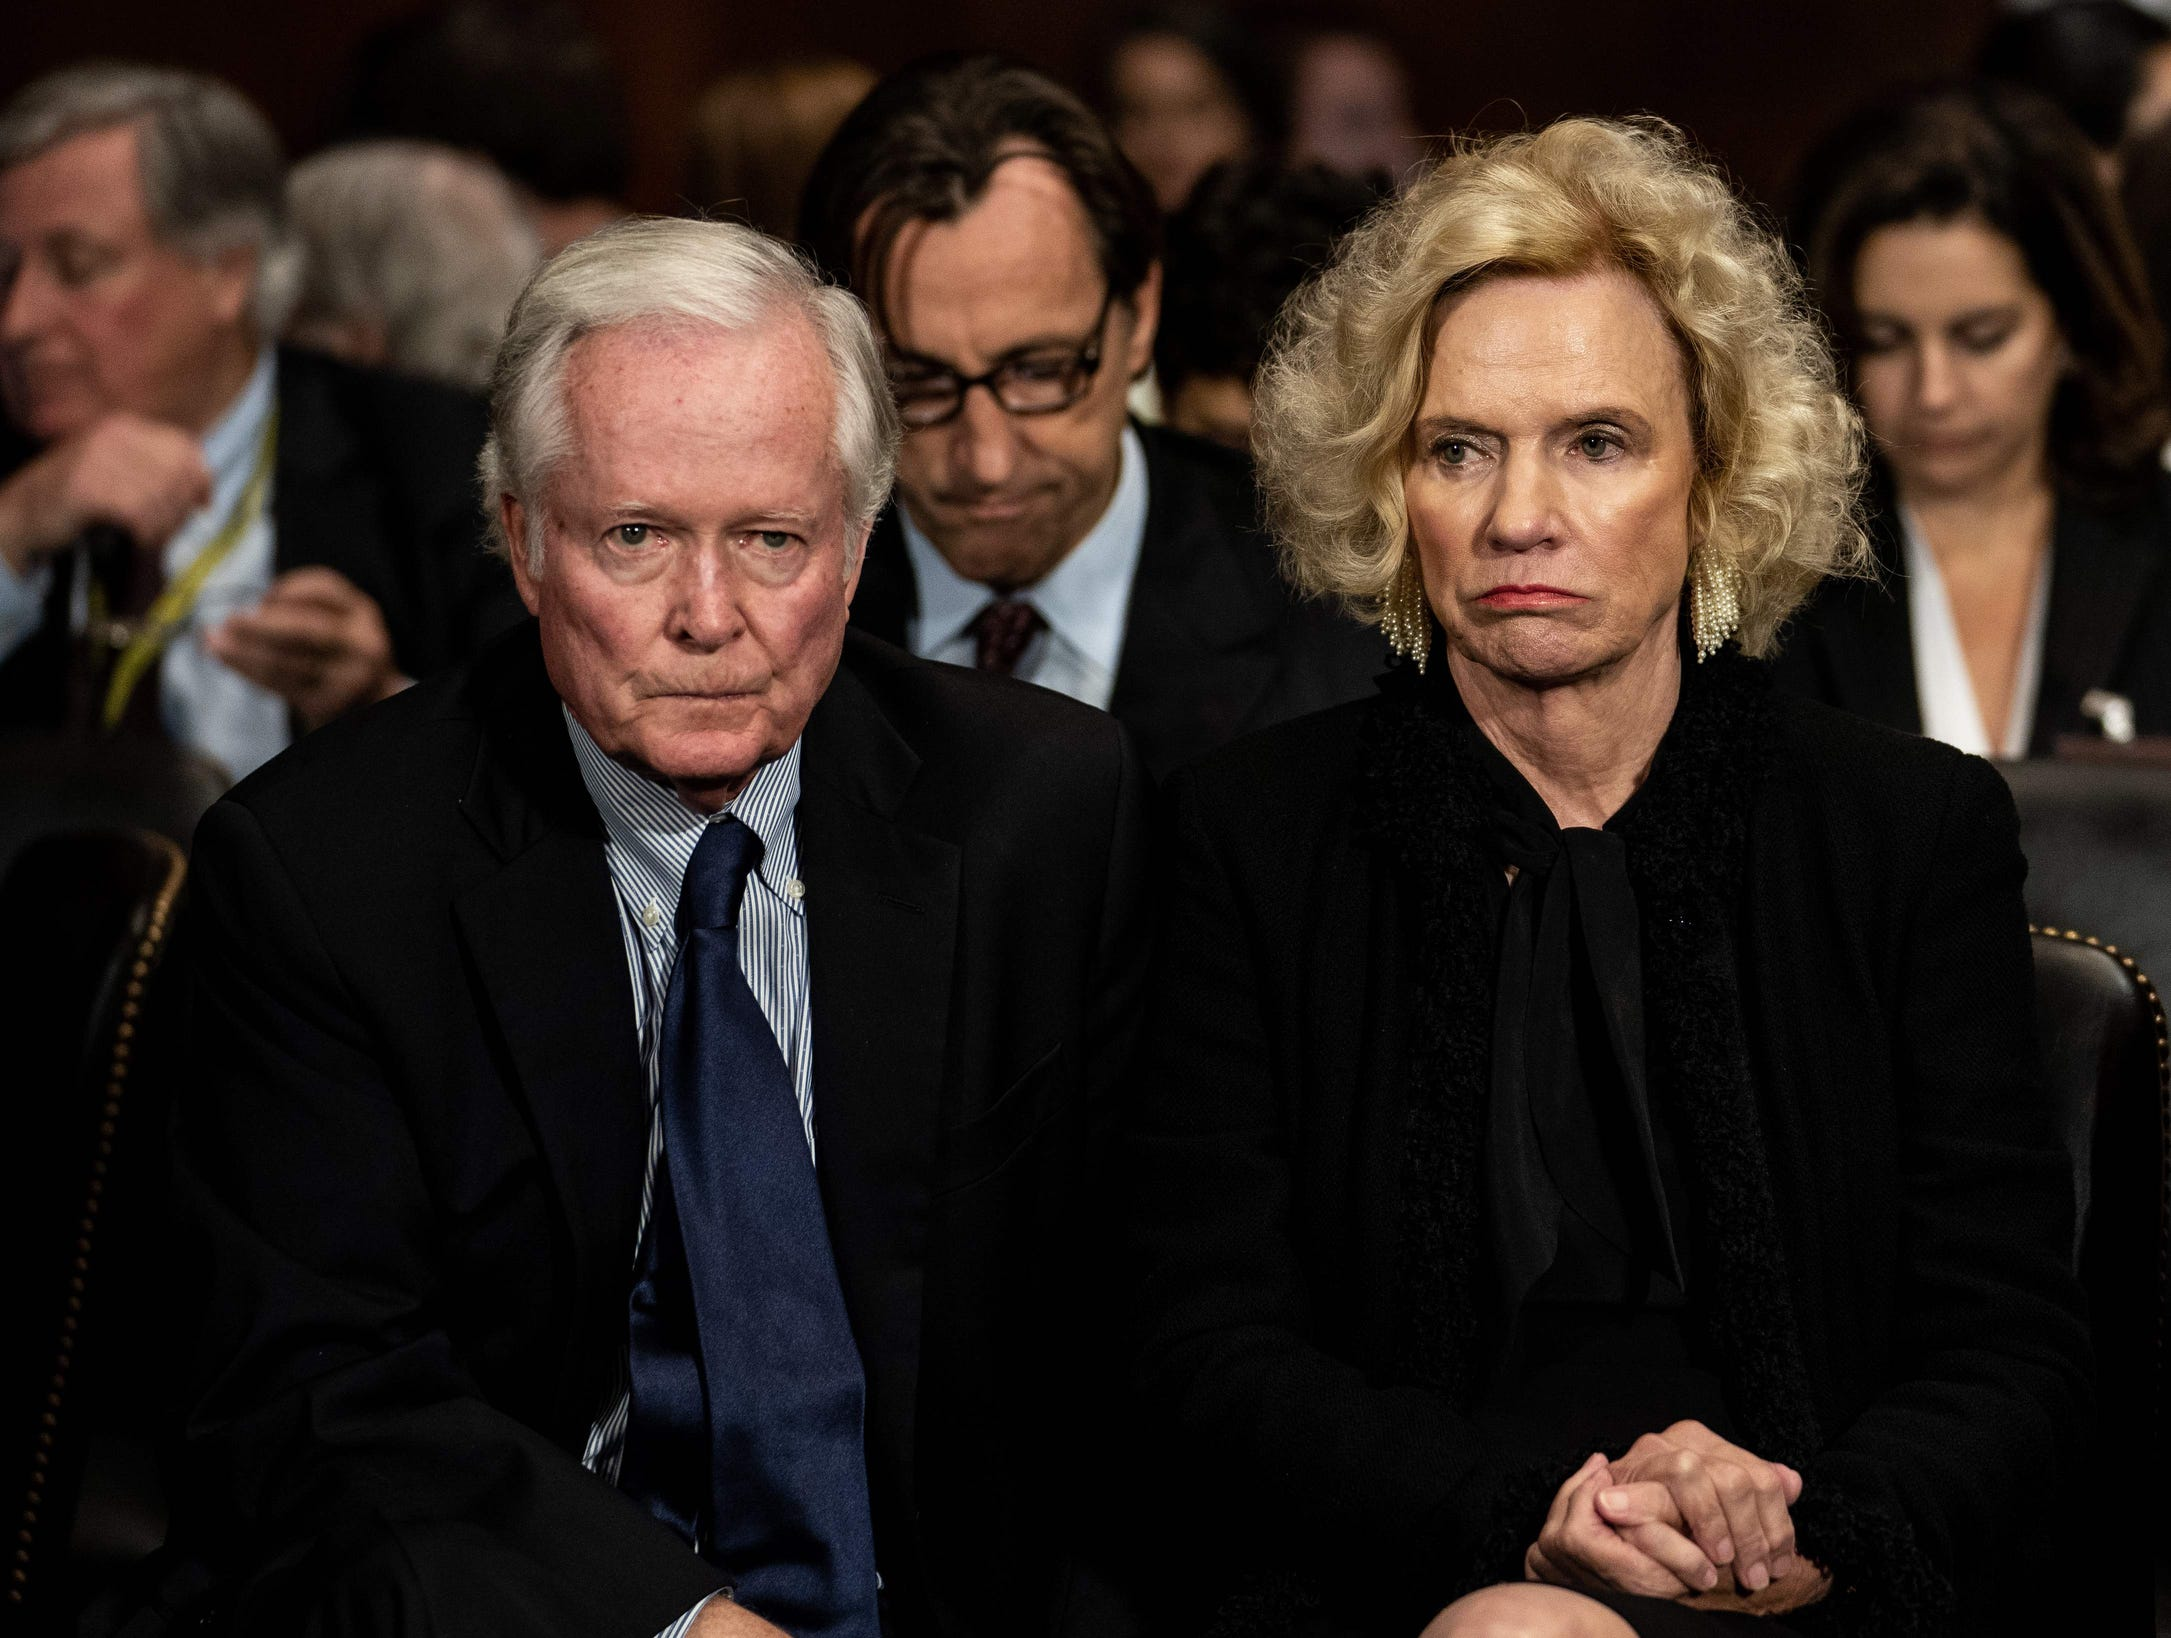 Judge Brett Kavanaugh's parents, Edward  and Martha Kavanaugh,  listen as their son testifies before the Senate Judiciary committee regarding sexual assault allegations.